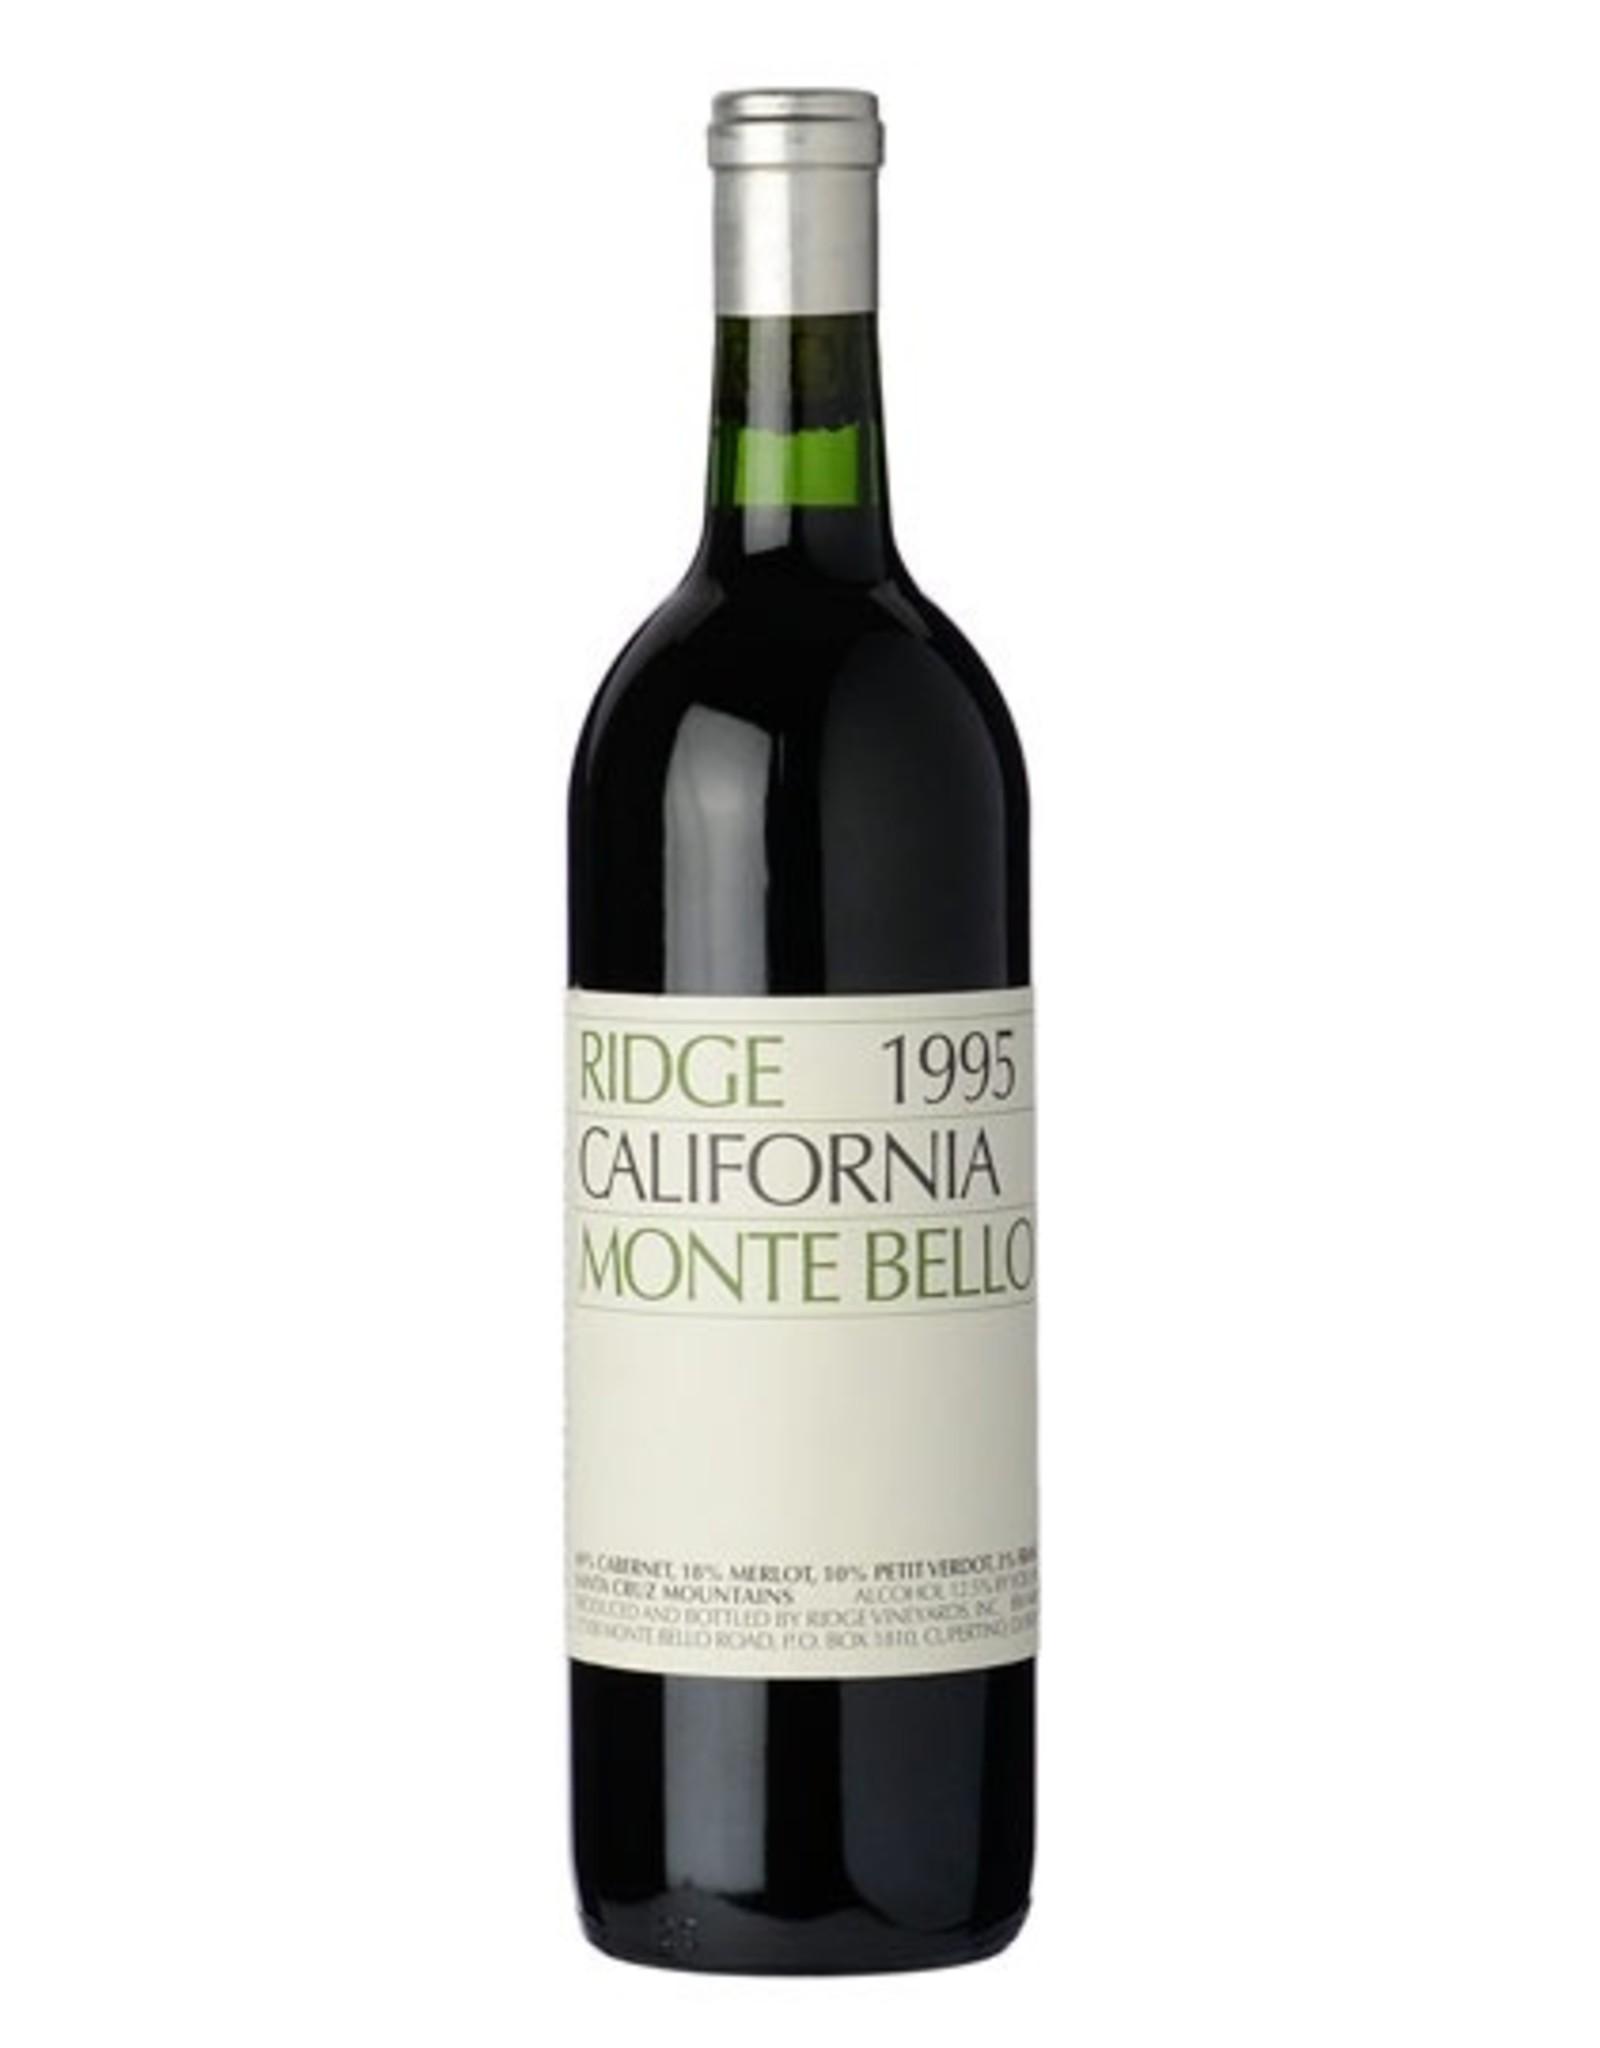 Red Wine 1995, Ridge Stanford Collector's Reserve Monte Bello Vineyards, Cabernet Sauvignon, Santa Cruz Mountains, San Francisco Bay, California, 14.4% Alc, CT , JS98